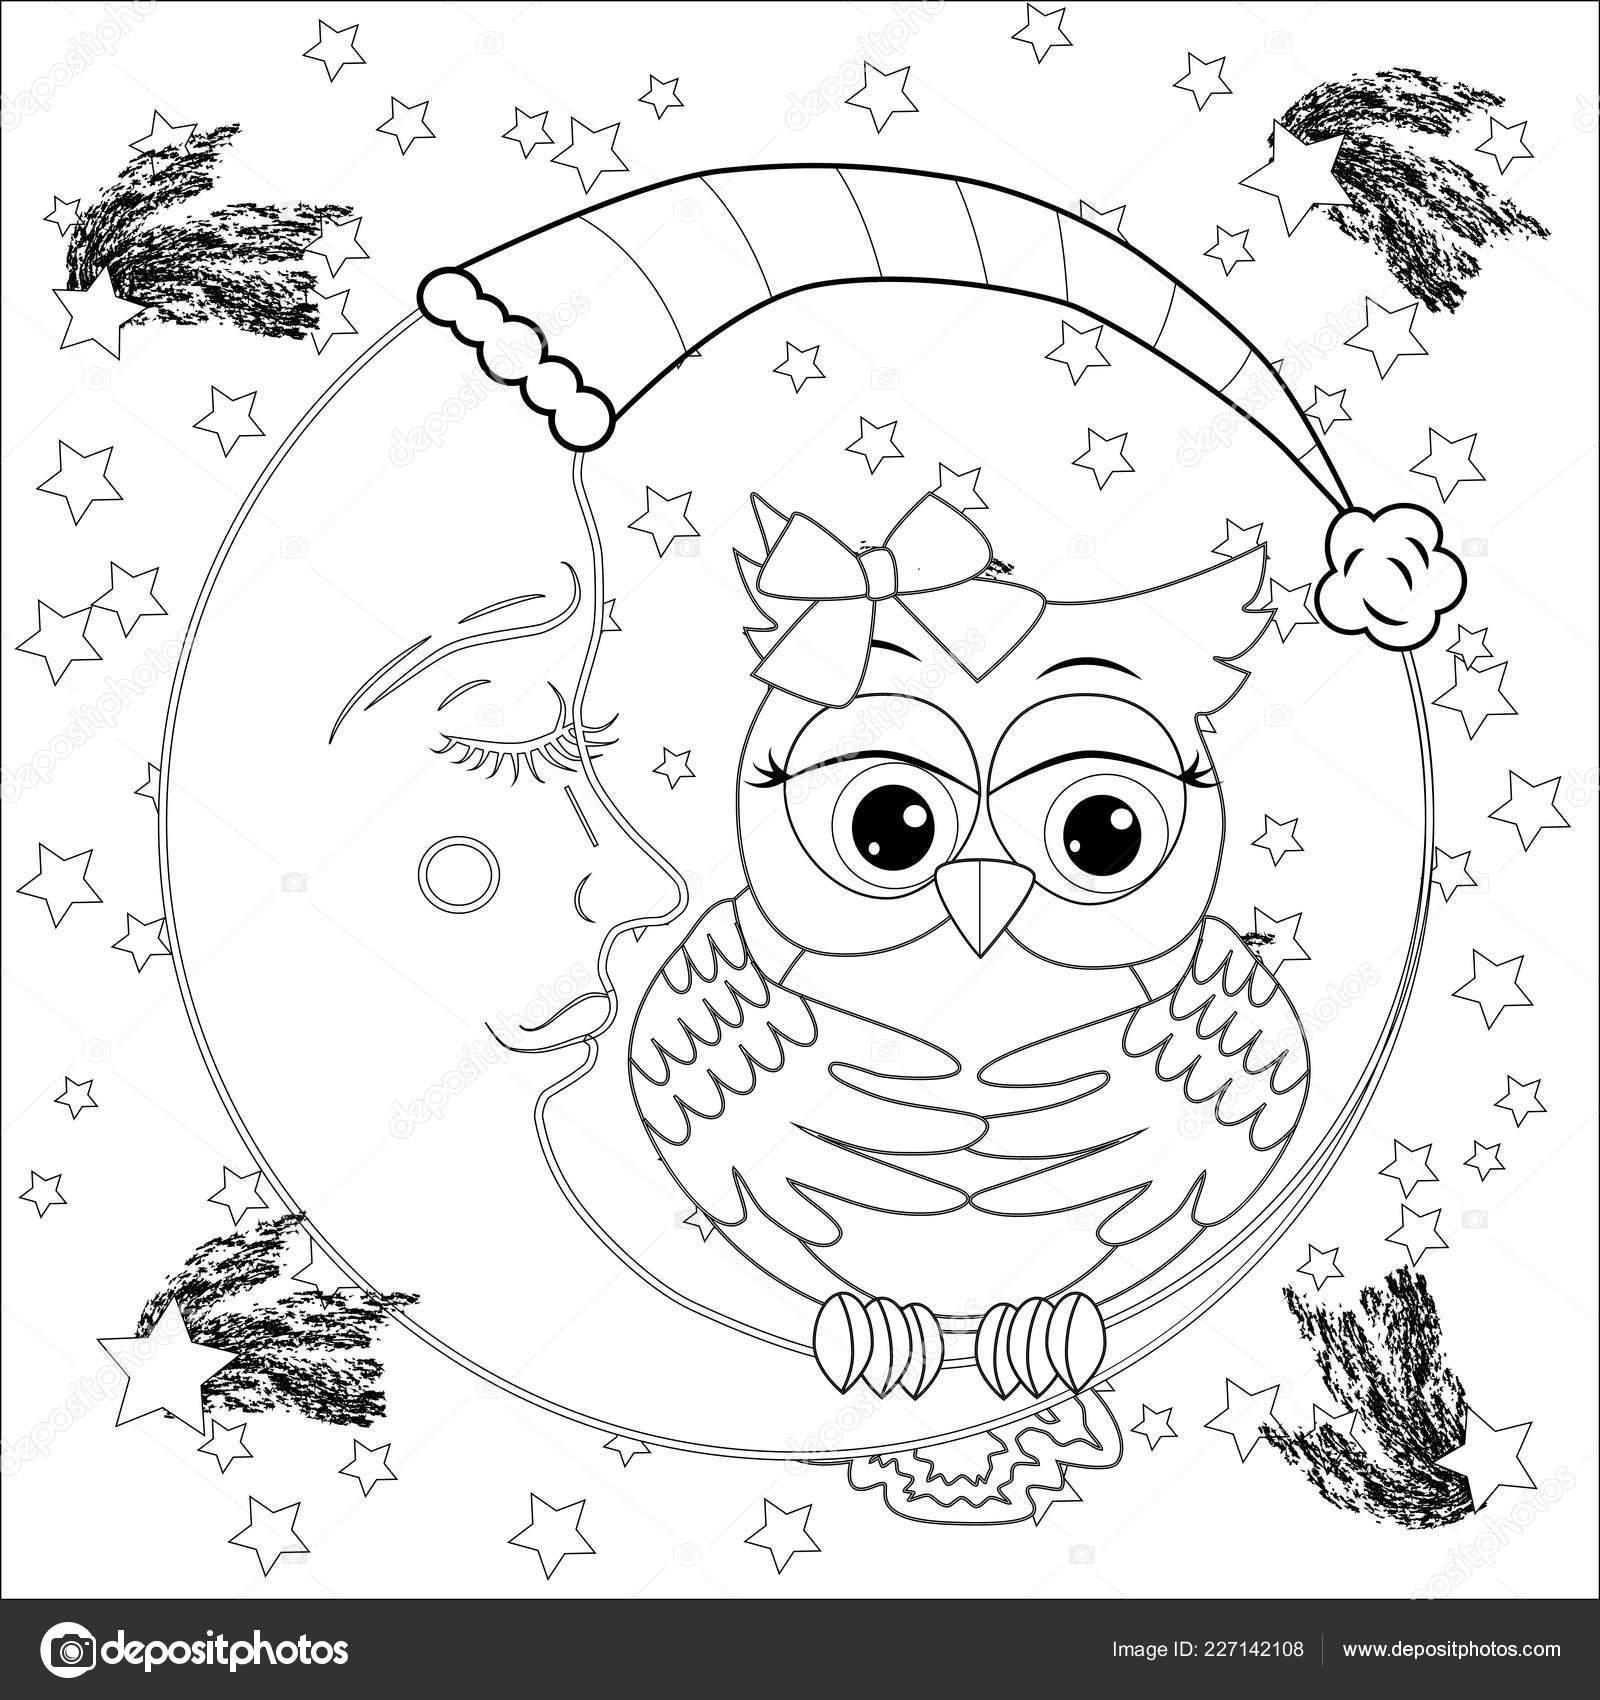 Coloriage Anti Stress Hibou.Hibou Mignon Sur Demi Lune Avec Etoiles Adulte Stress